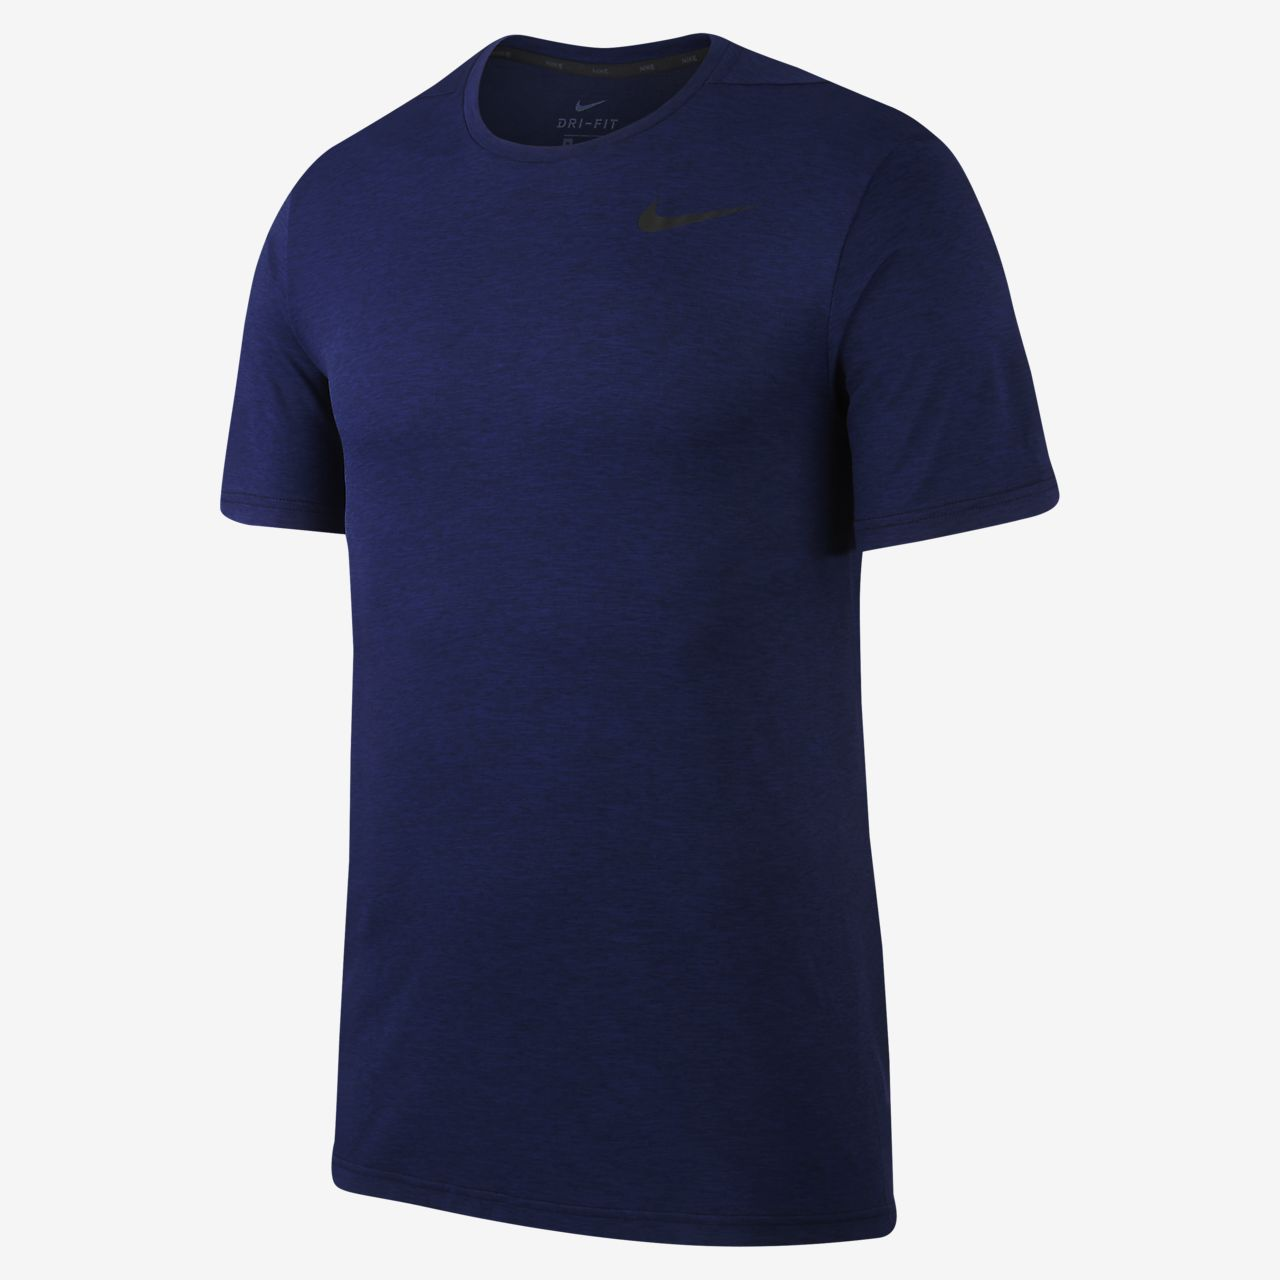 4ed27a75e843 Nike Breathe Men s Short-Sleeve Training Top. Nike.com FI